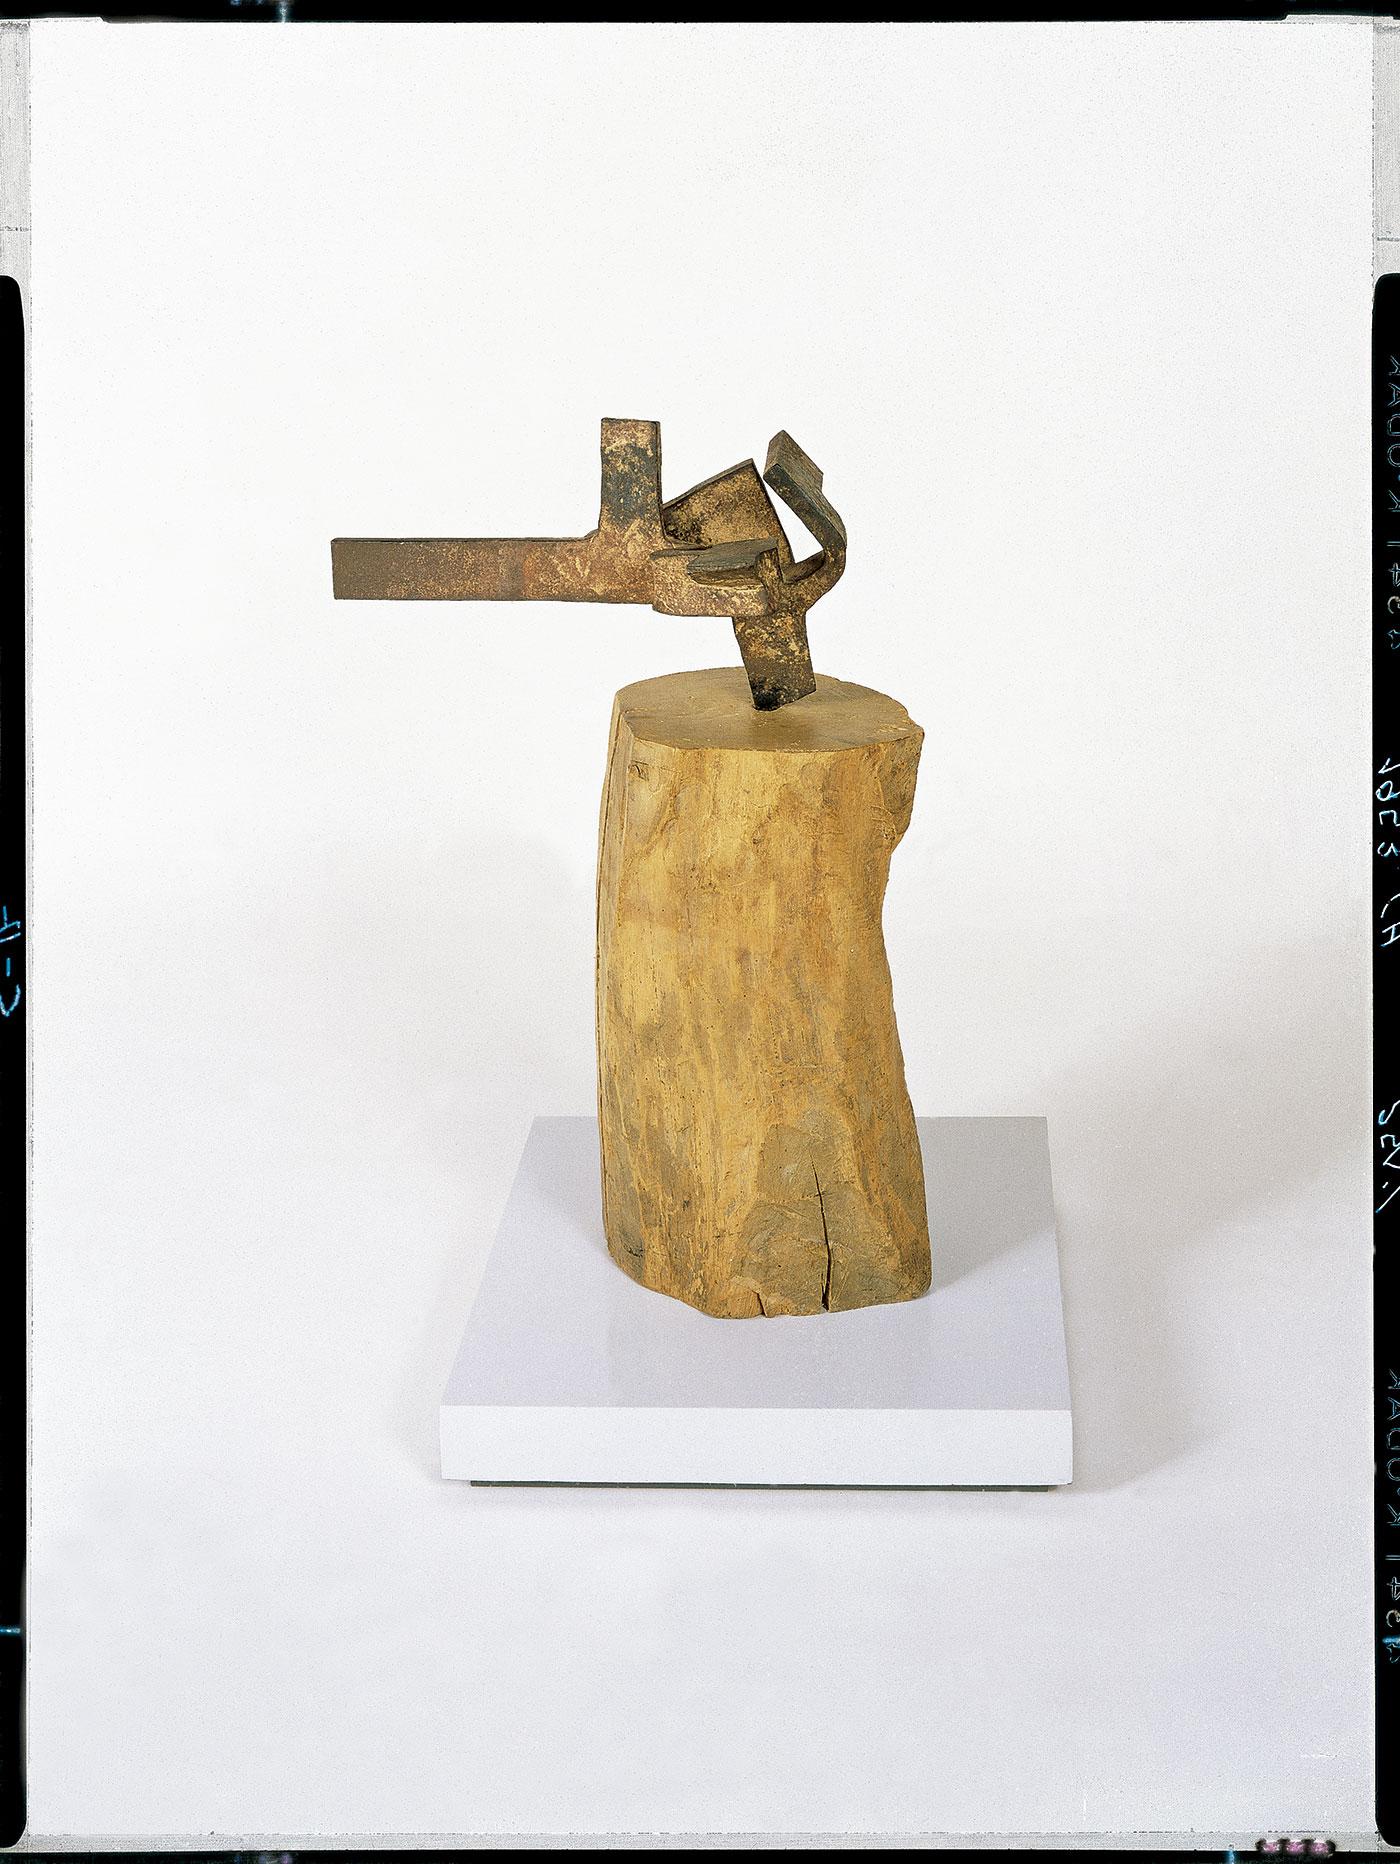 Eduardo Chillida. Yunque de sueños XIII, 1953-1954. © Zabalaga- Leku, VEGAP, Madrid, 2016.